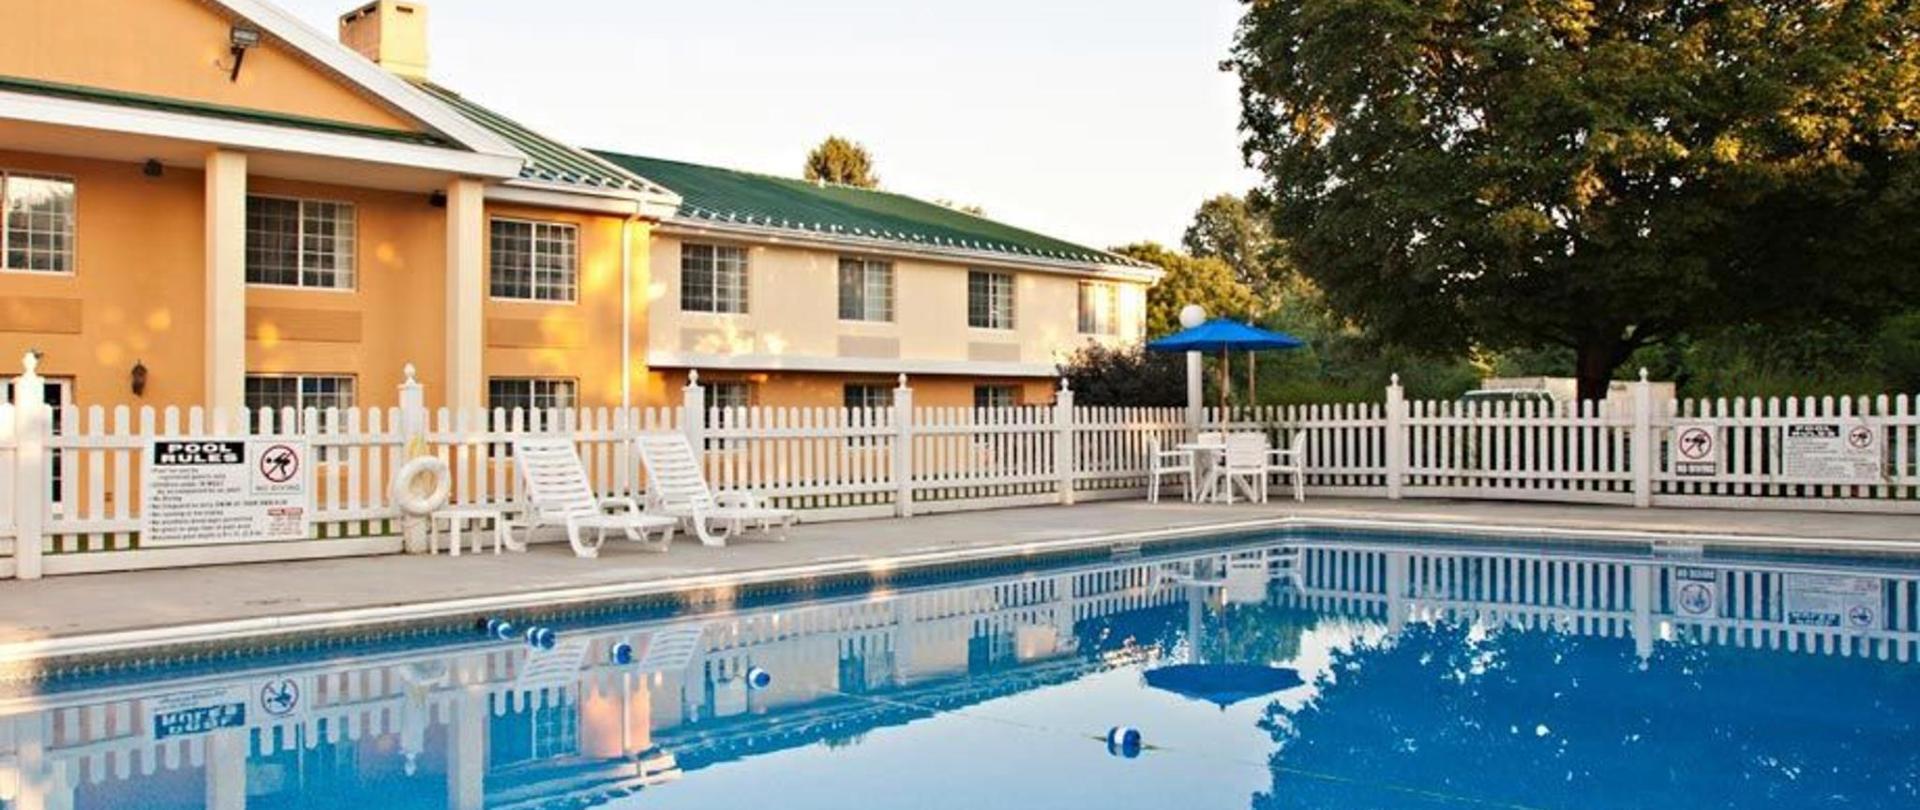 comfort-inn-harrisburg-hotel-pennsylvania-outdoor-pool.jpg